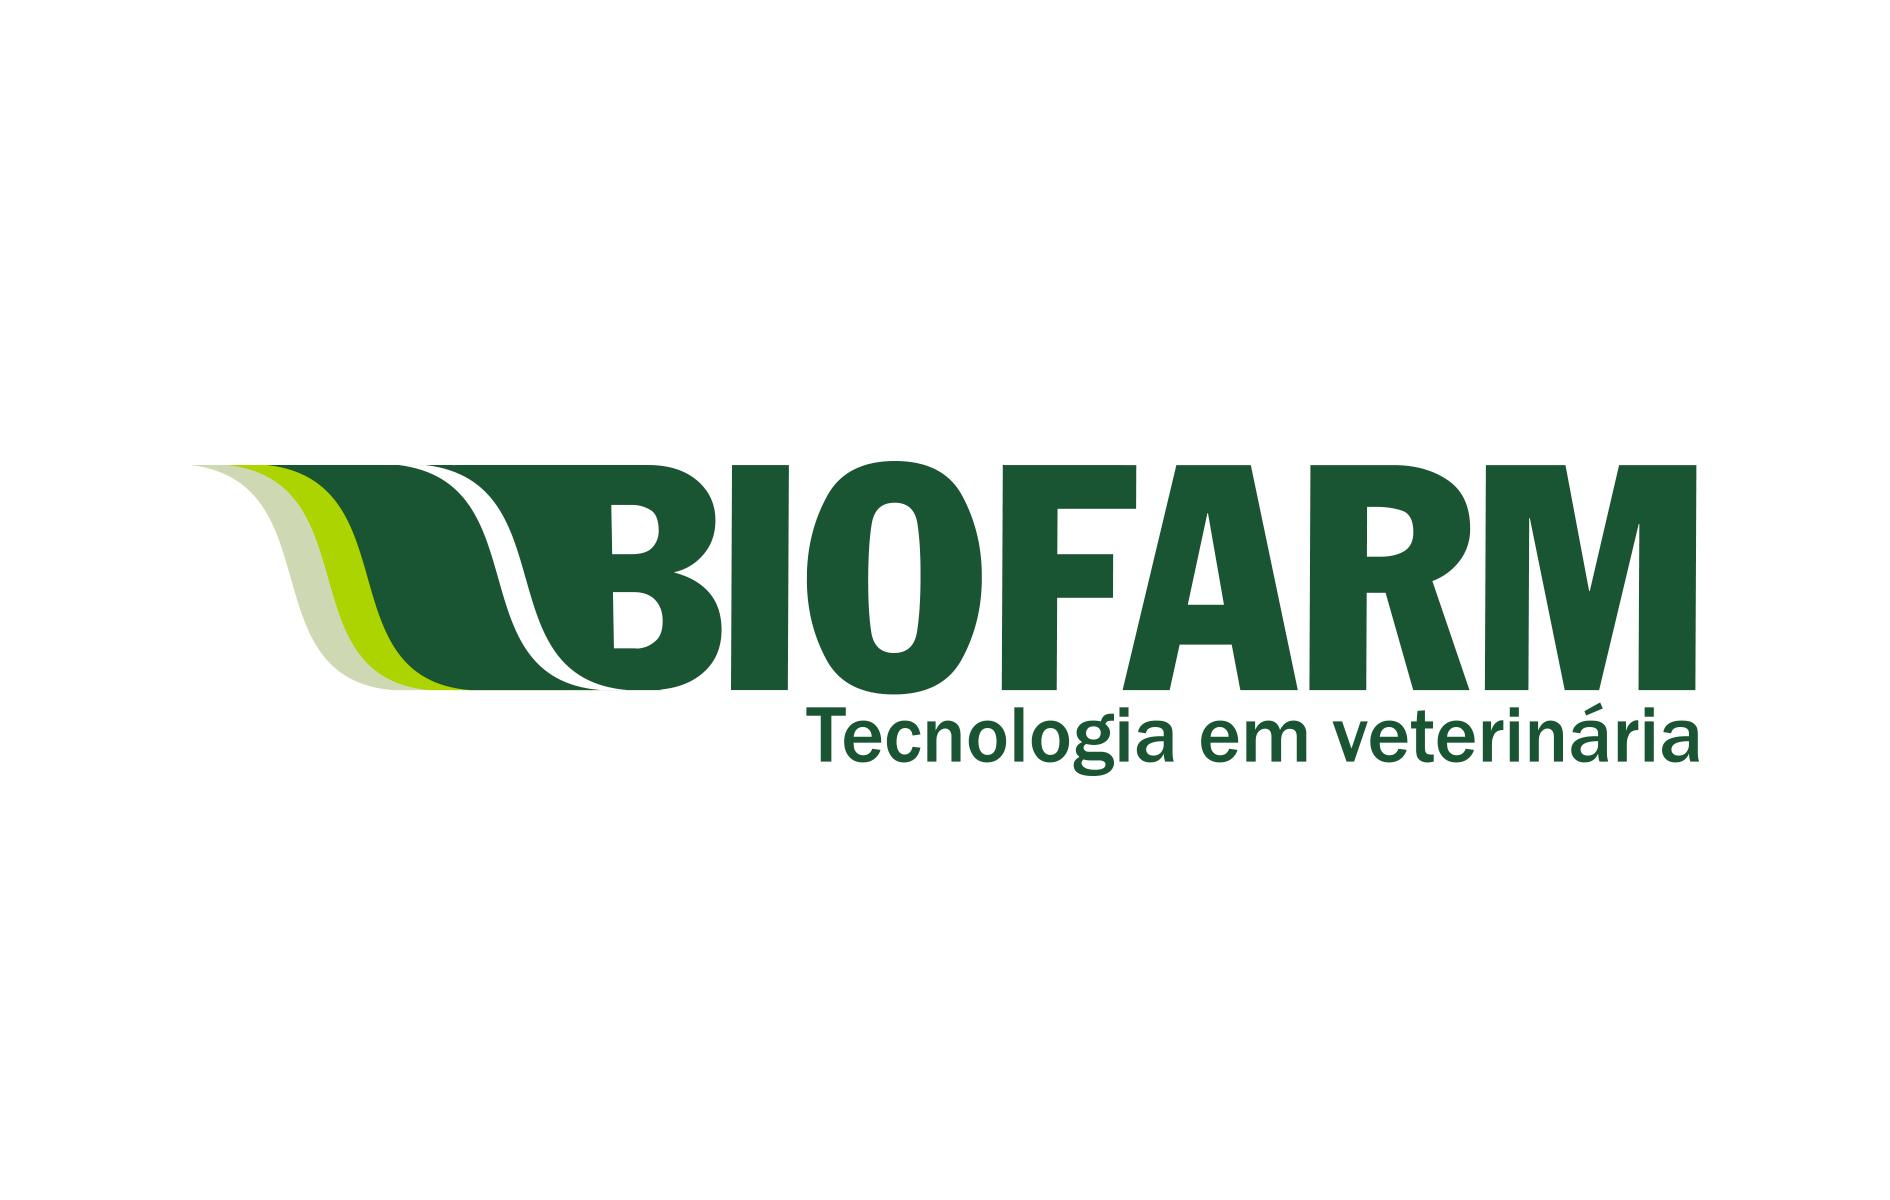 biofarm patrocinada de globalvet